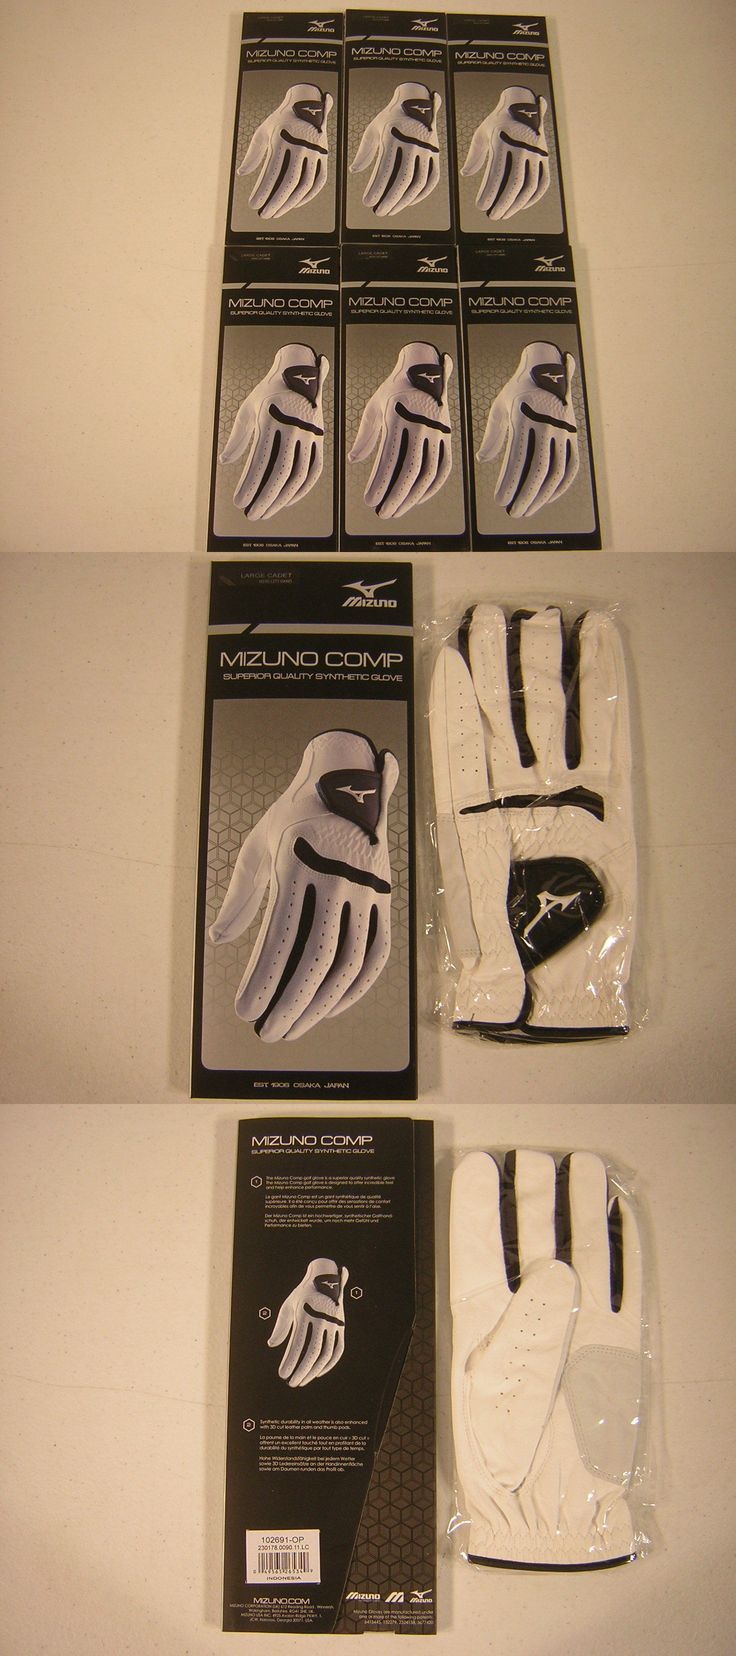 Mens gloves cadet - Golf Gloves 181135 New Mizuno Golf Comp Mens Gloves Size Cadet Large 6 Pack